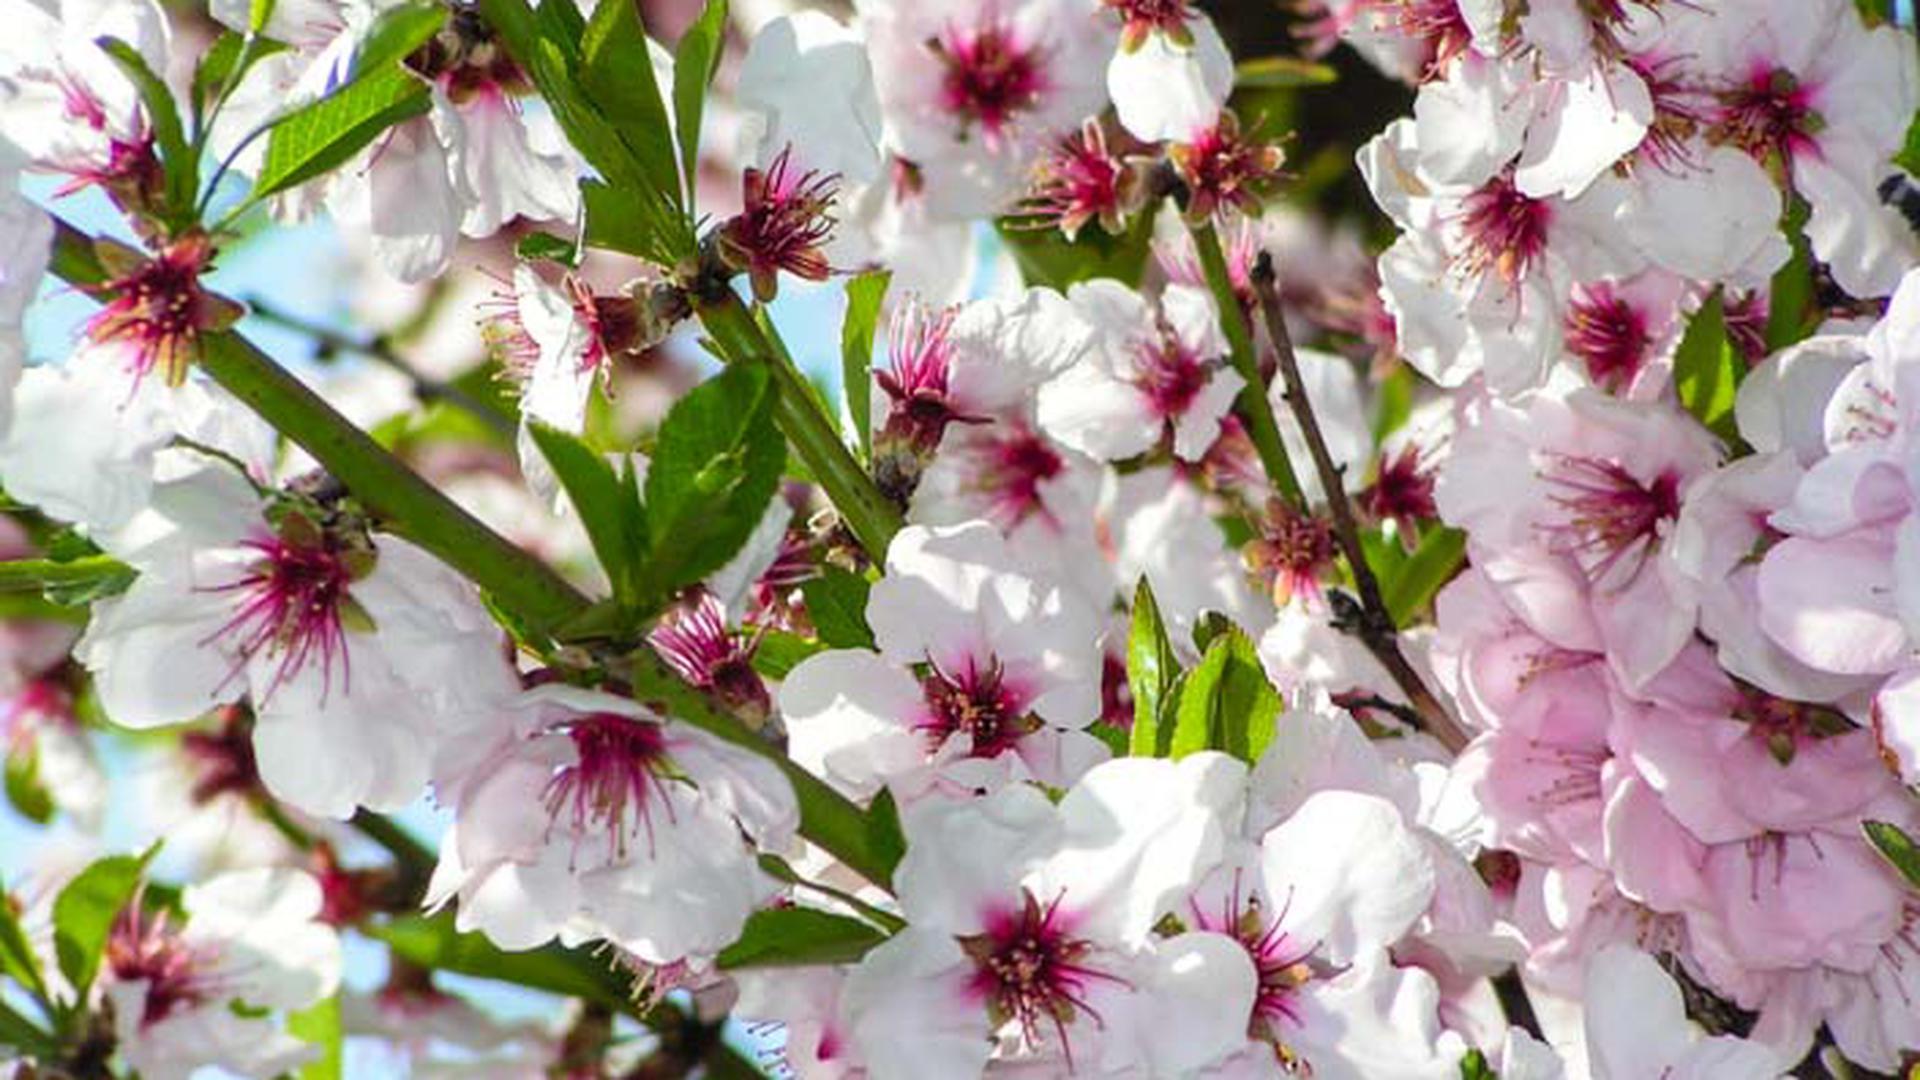 Das Mandelblütenfest in Gimmeldingen ist wegen des Coronavirus abgesagt.